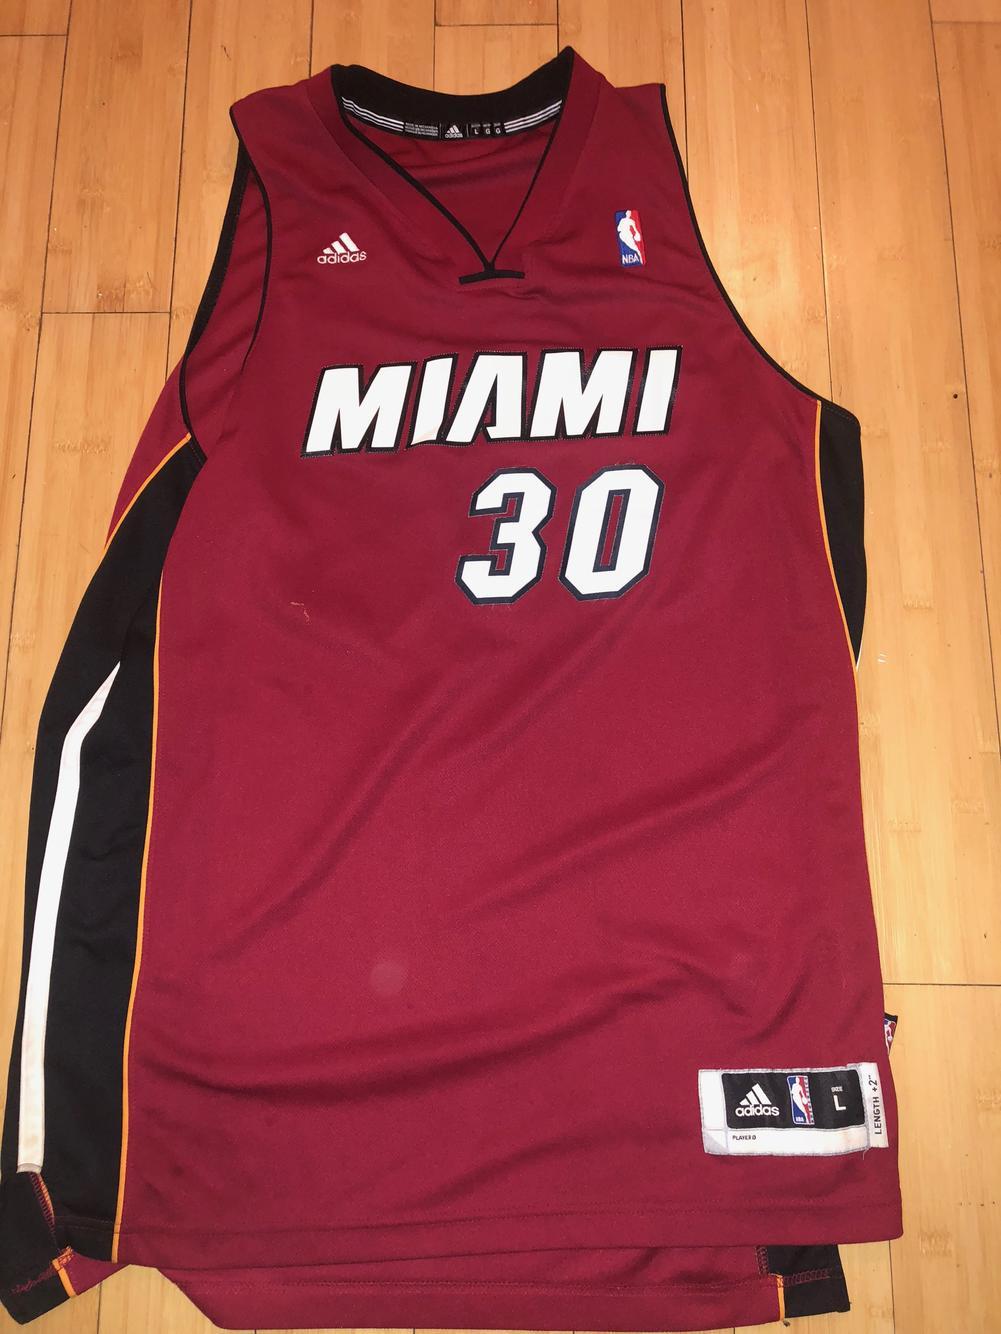 Large Adidas Miami Heat Jersey